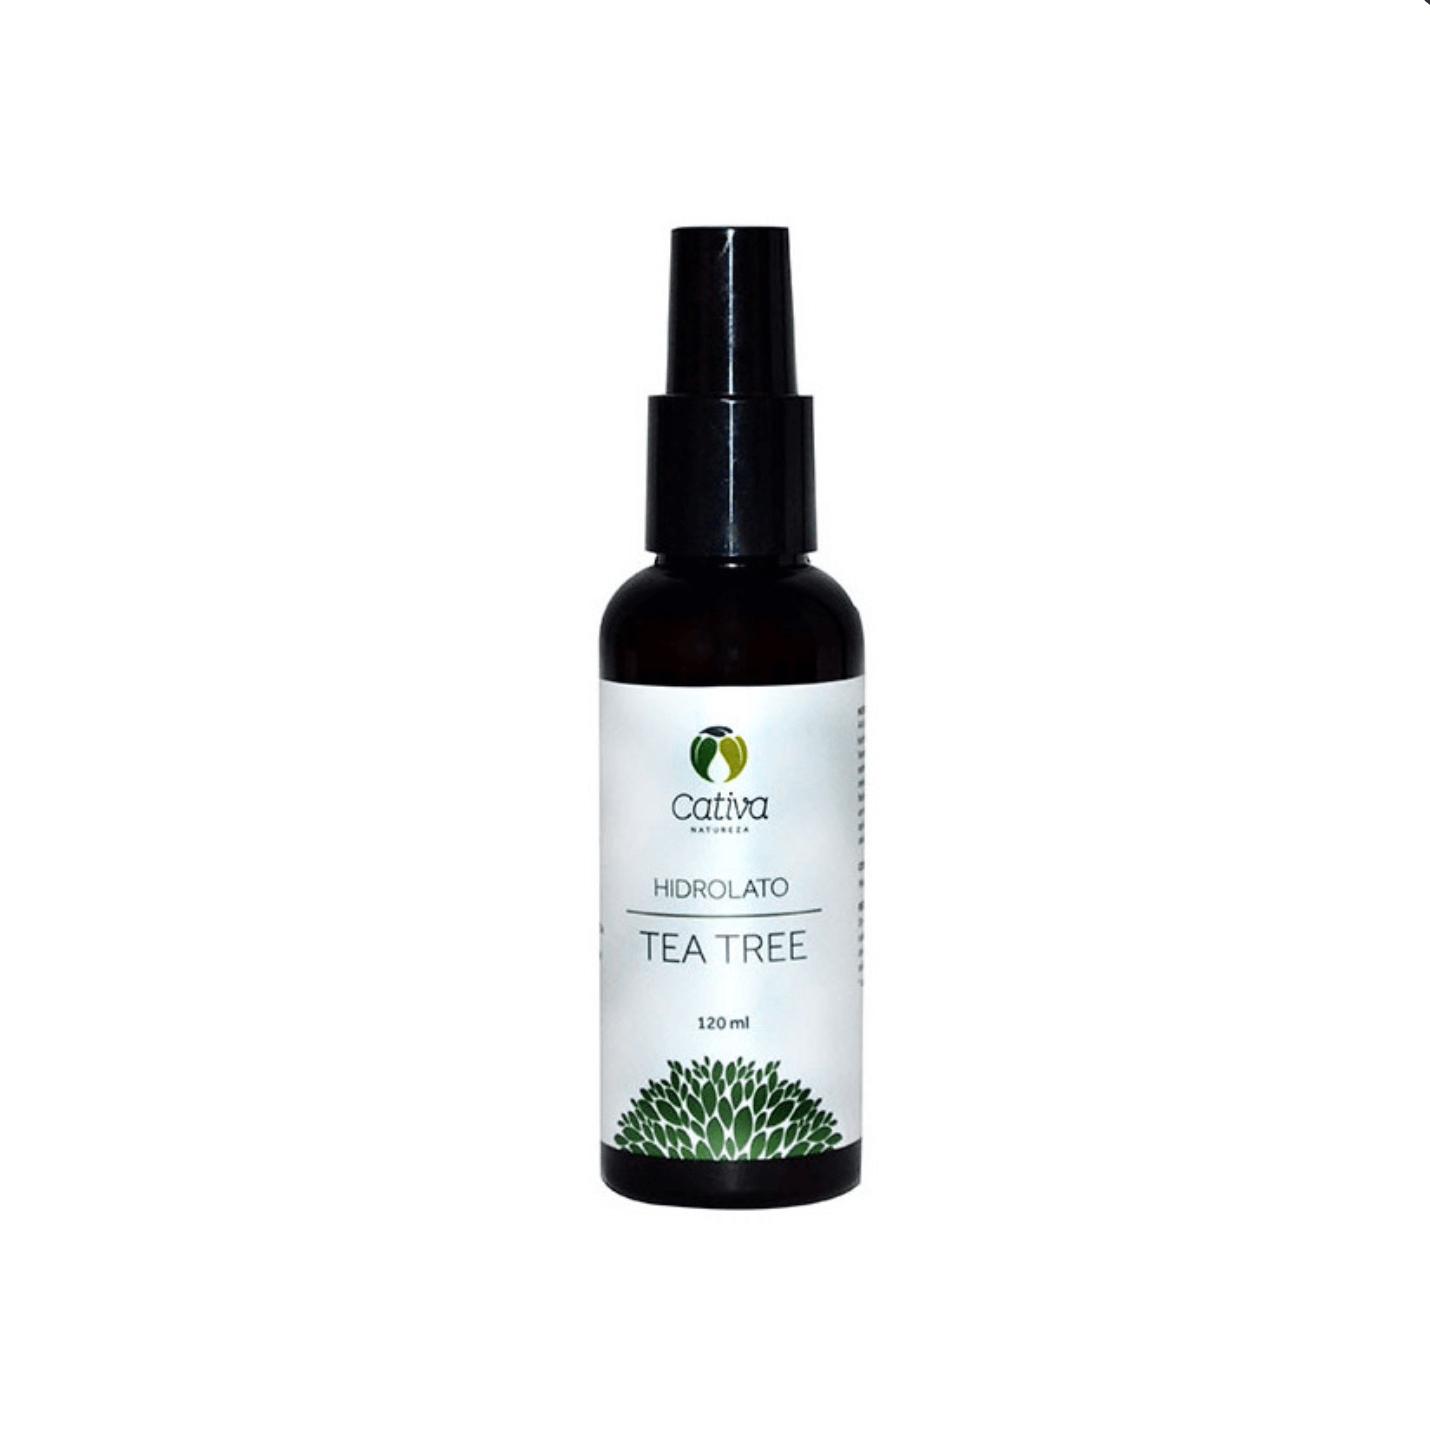 Hidrolato - Tea Tree - Cativa Natureza